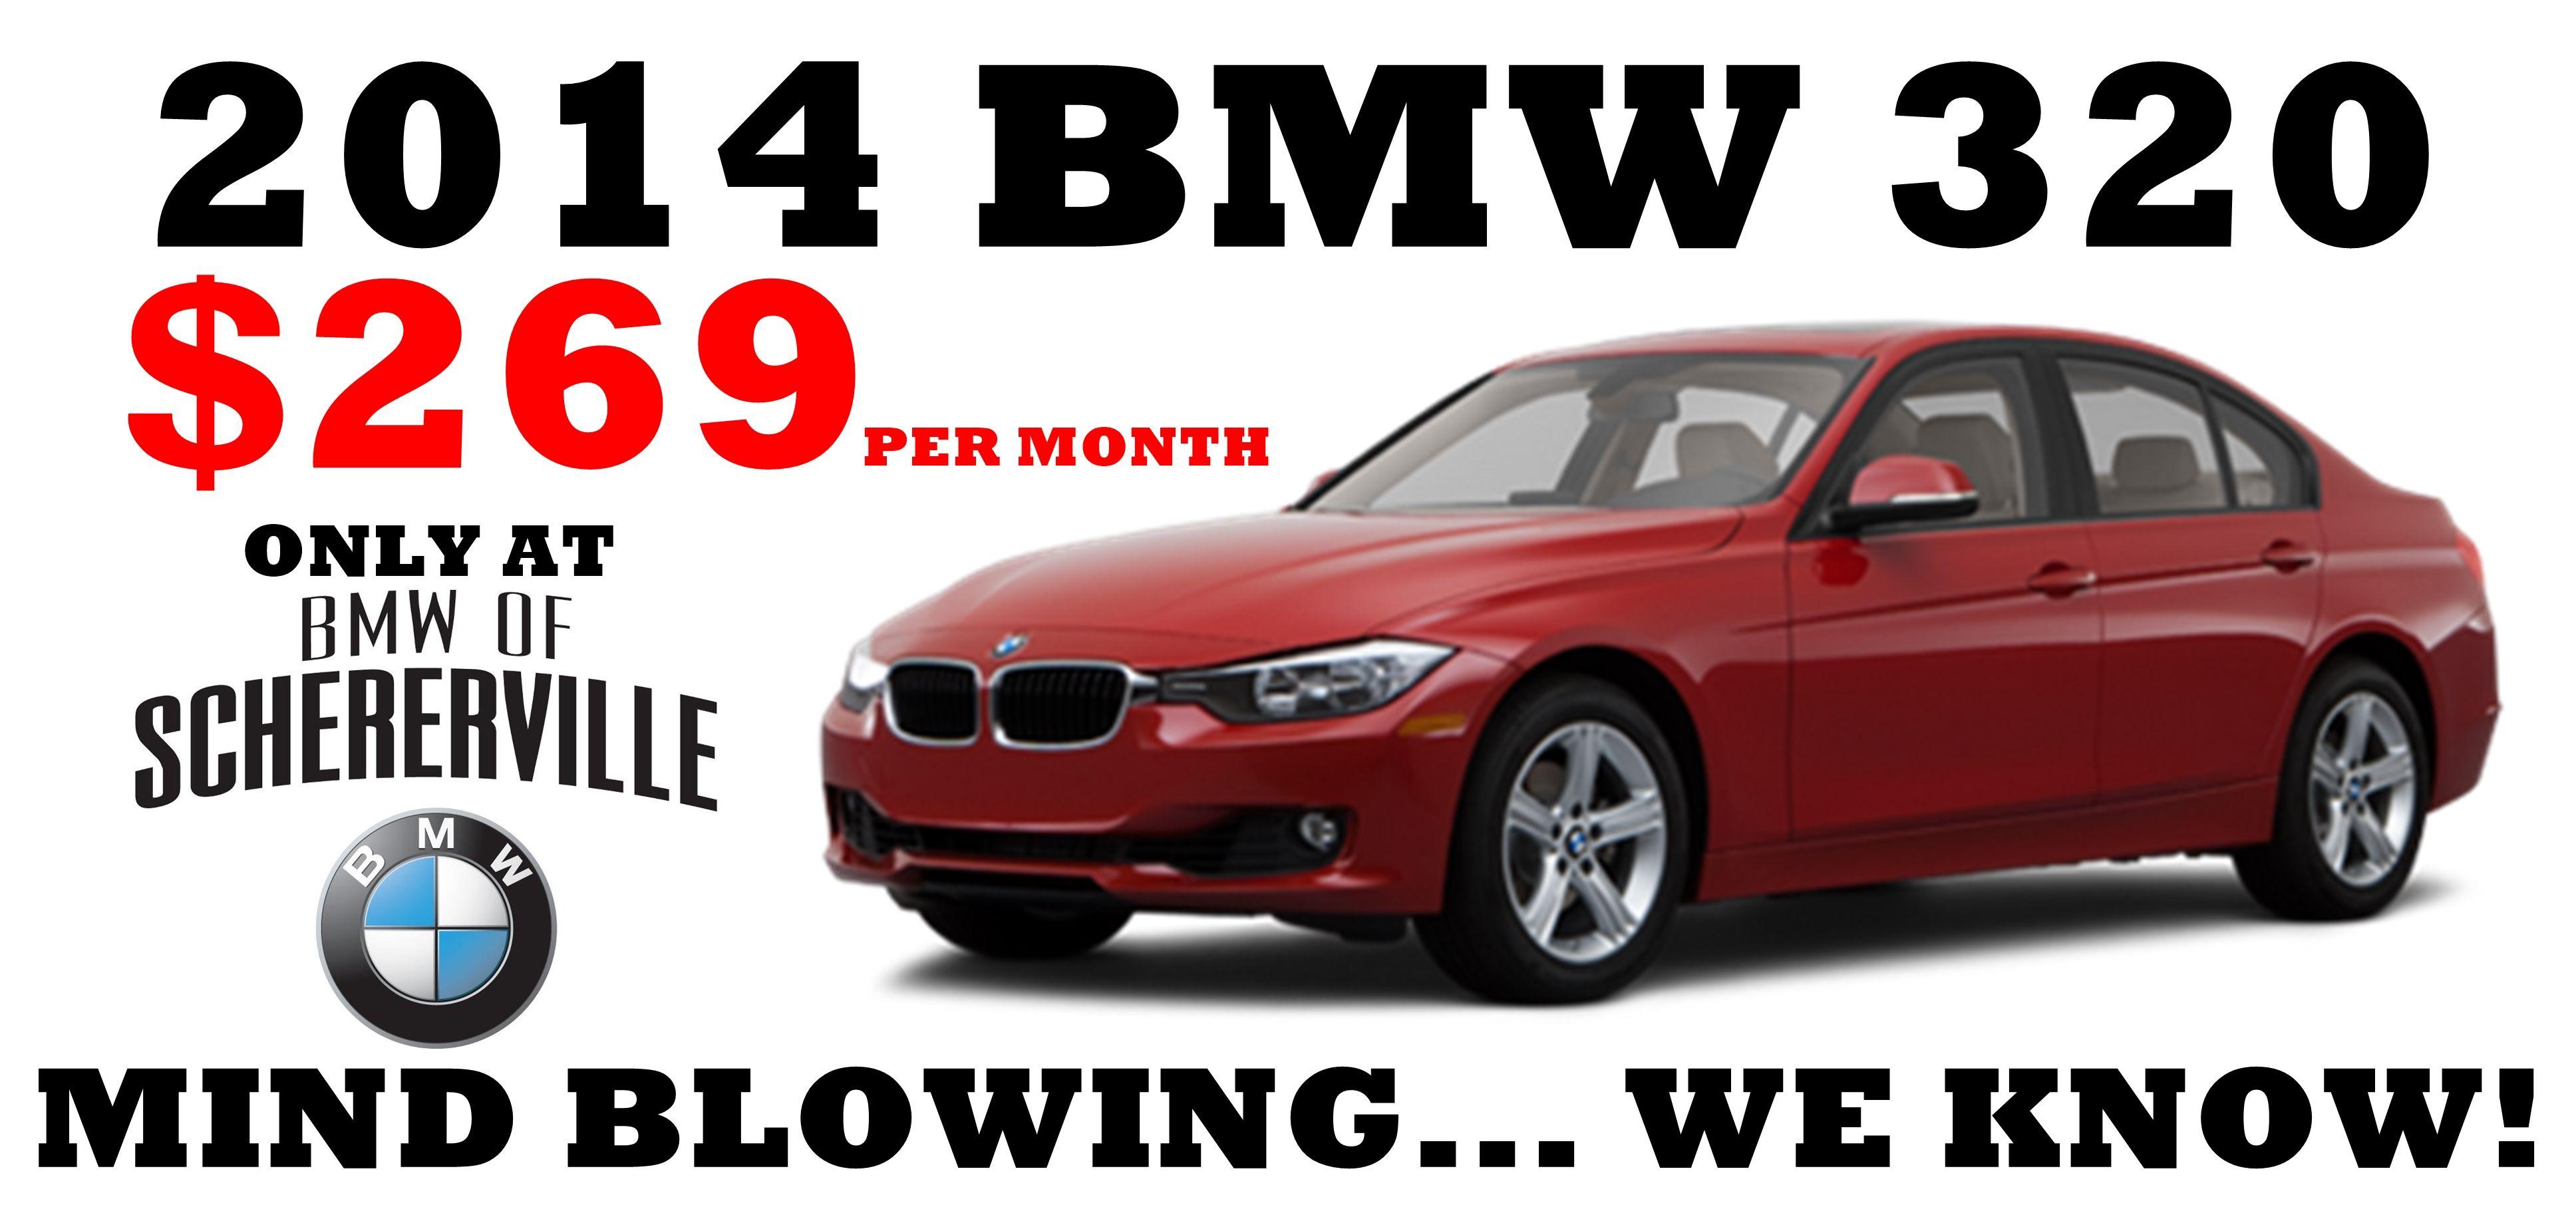 Billboard layout. BMW of Schererville Social media